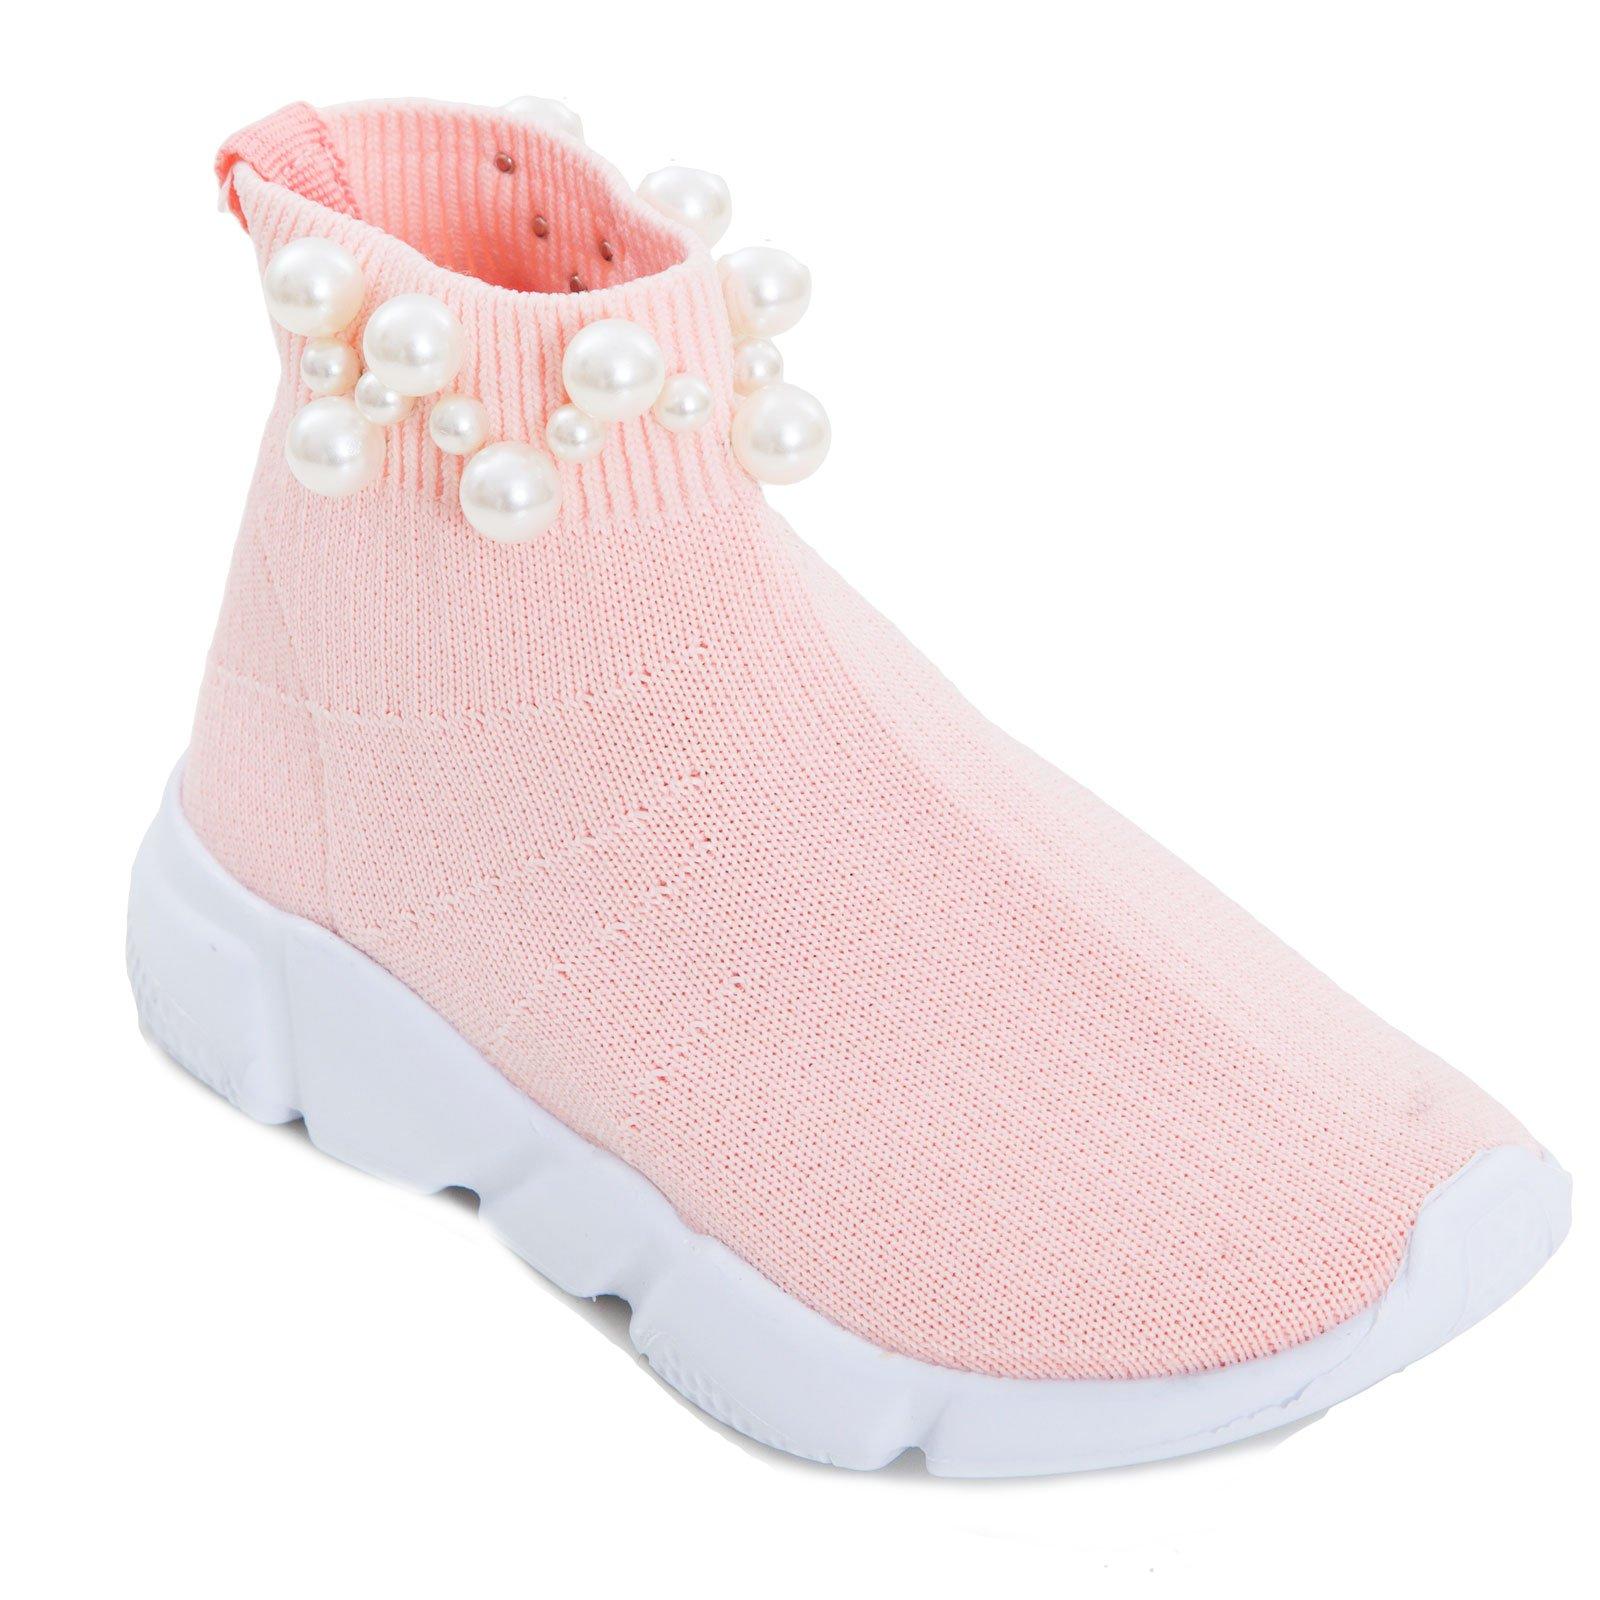 fe10e45a281141 Toocool – Scarpe Bimba Bambina calzino Perle Sport Tessuto Elastico  Sneakers Sportive 963B